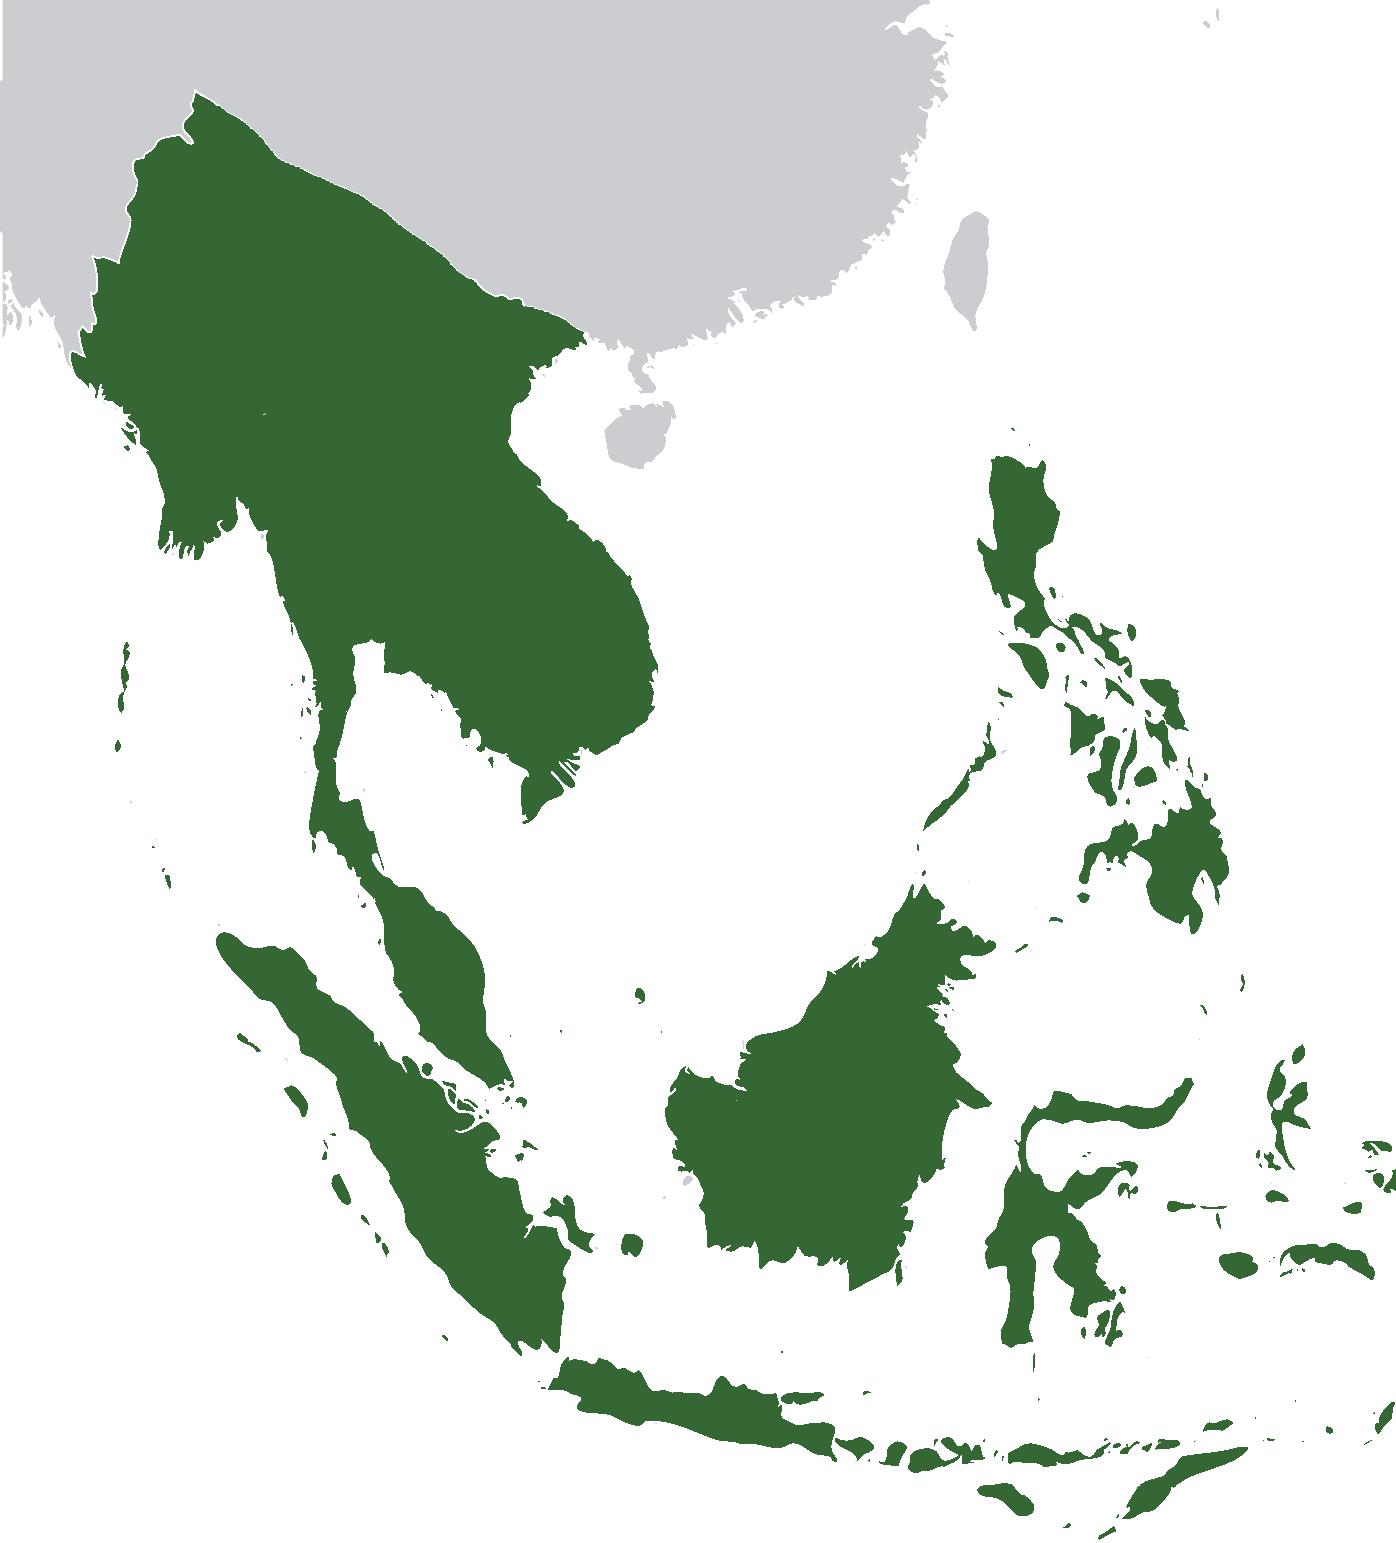 Khmer Empire Map The Khmer Empire in 2014